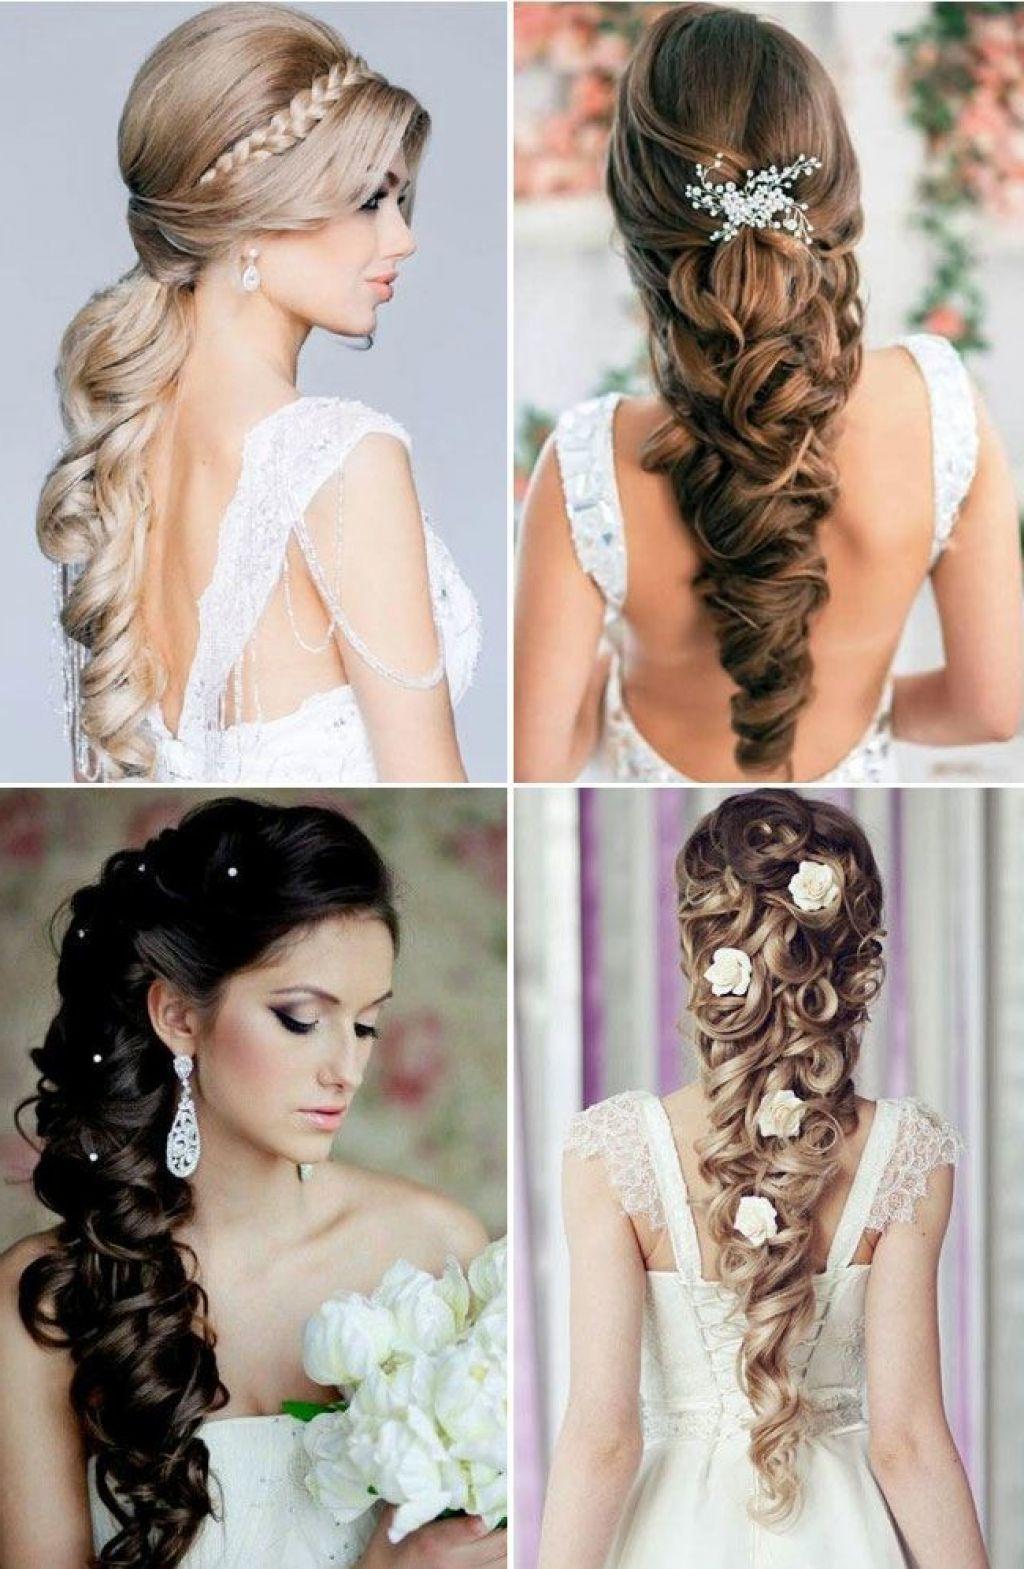 pin by shanna lee on hair | long hair wedding styles, bride